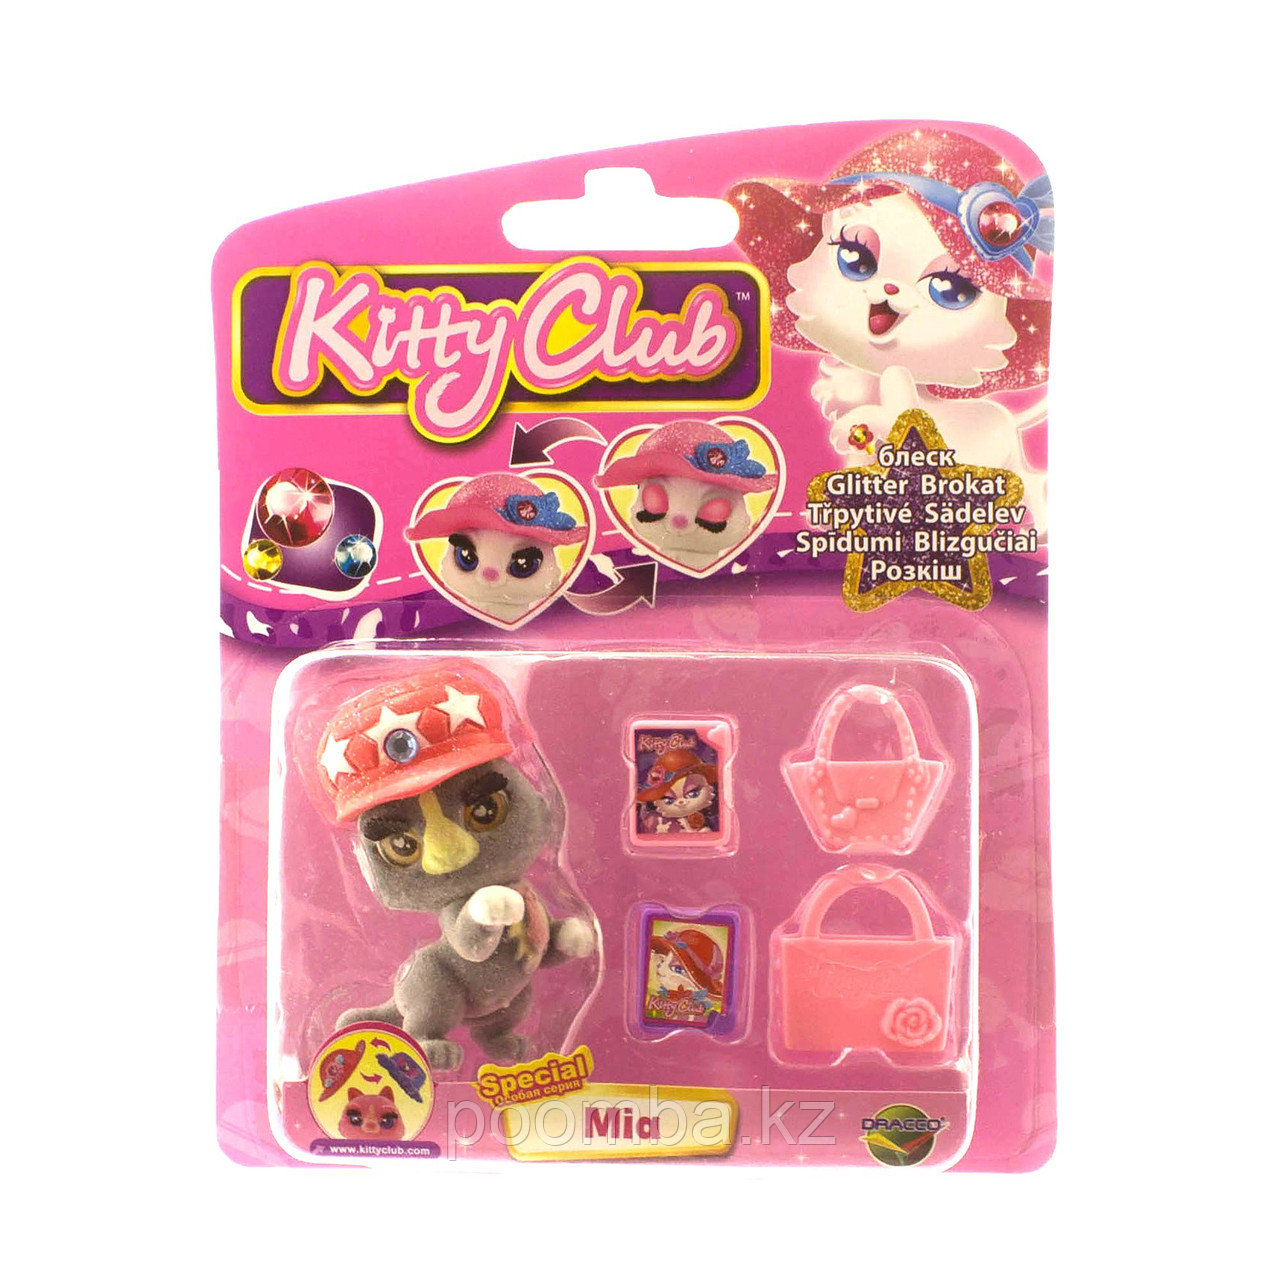 Фигурка Kitty Club «Mia» с аксессуарами в блистере